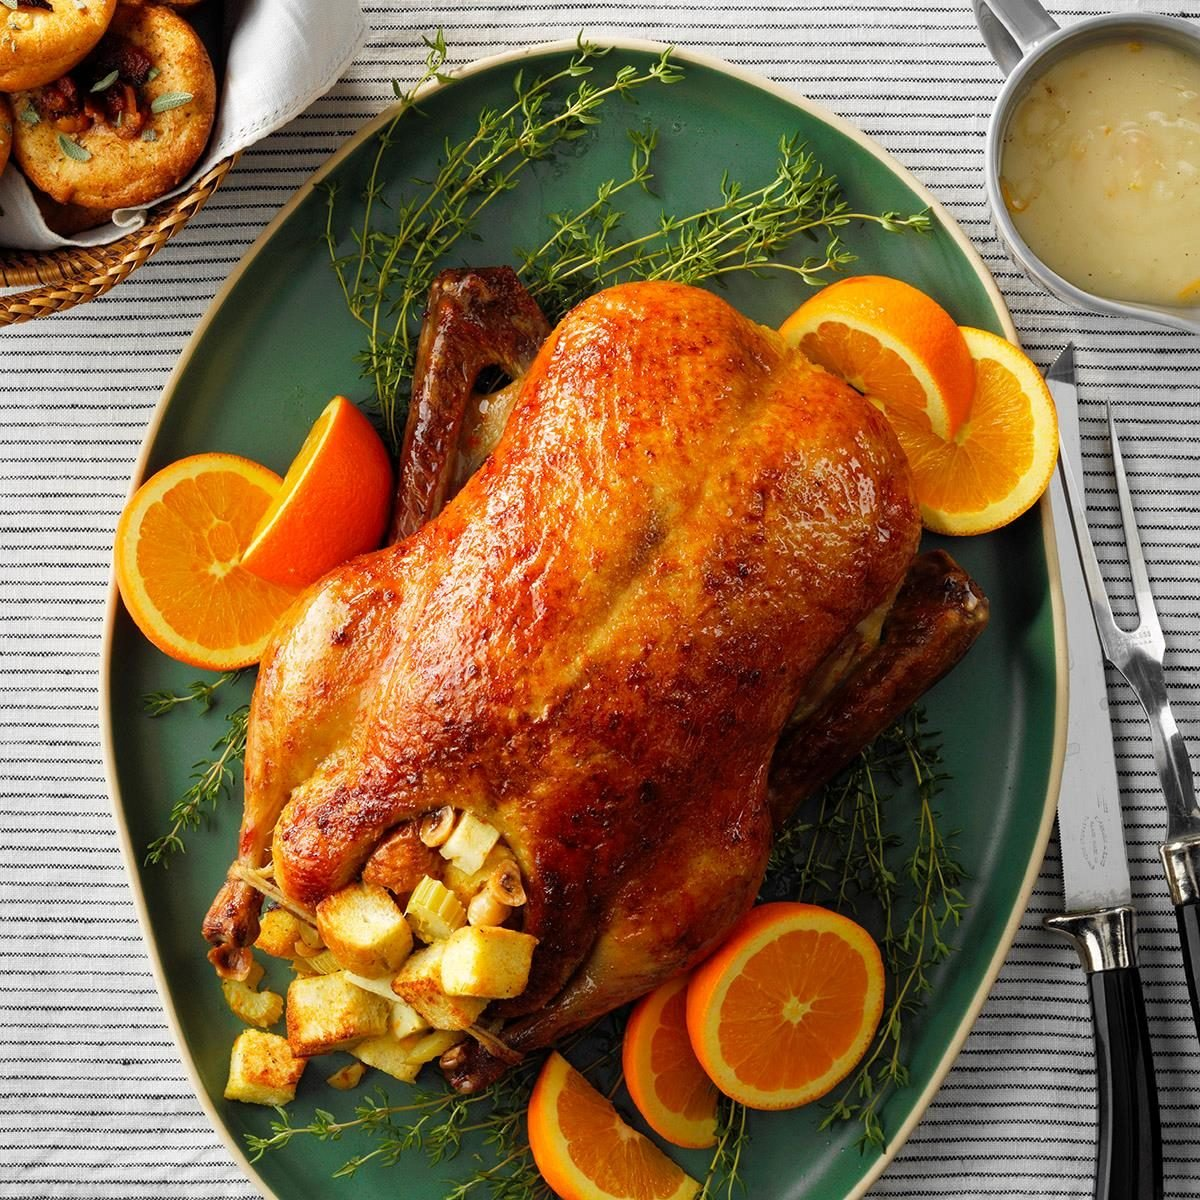 36 Christmas Mains That Aren't Ham